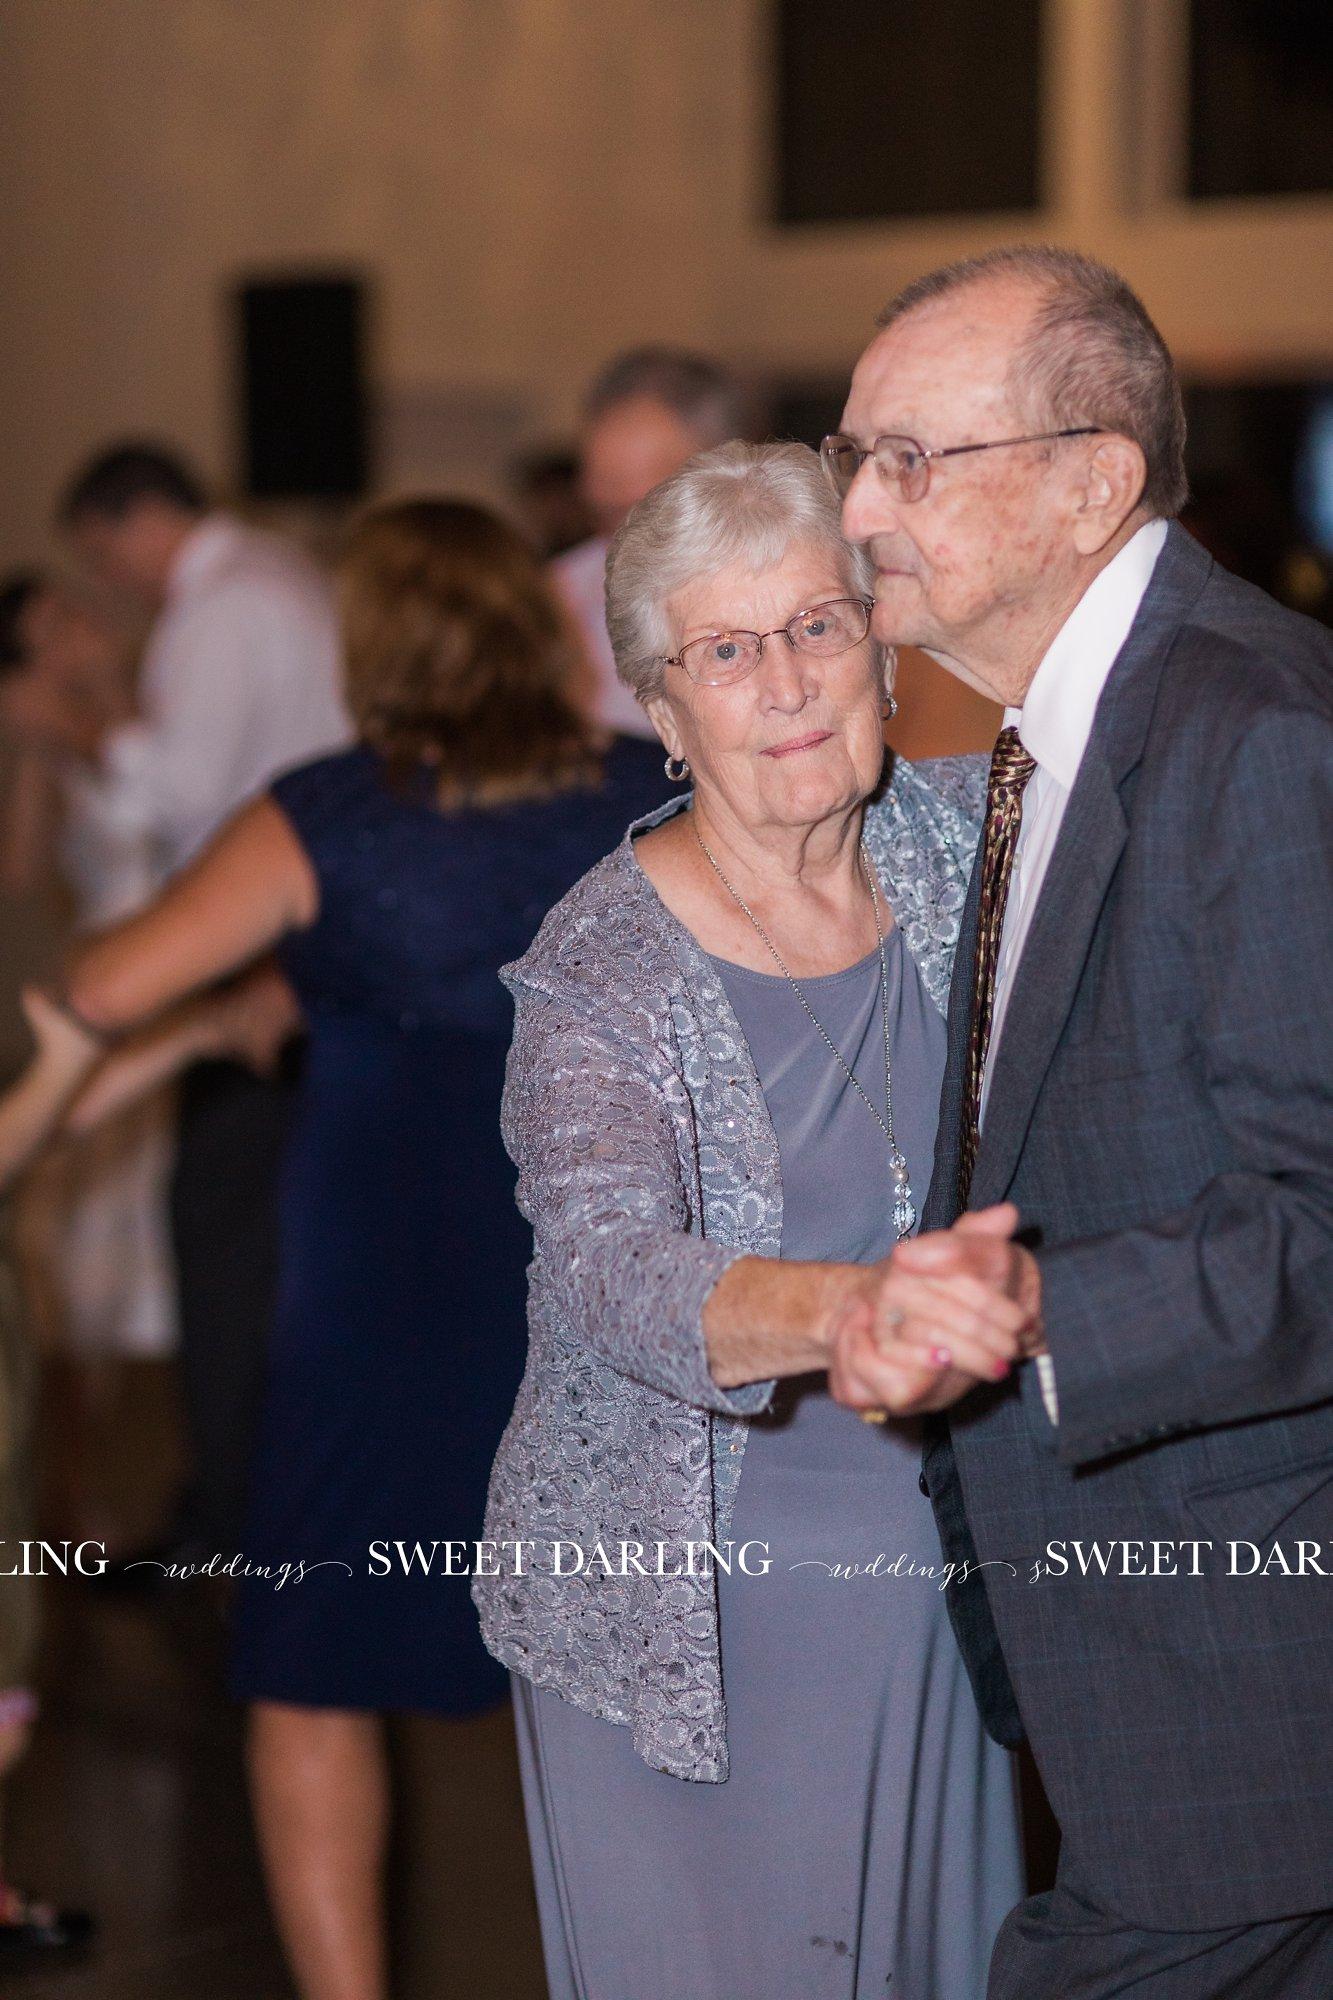 Sweet couple dancing at wedding reception